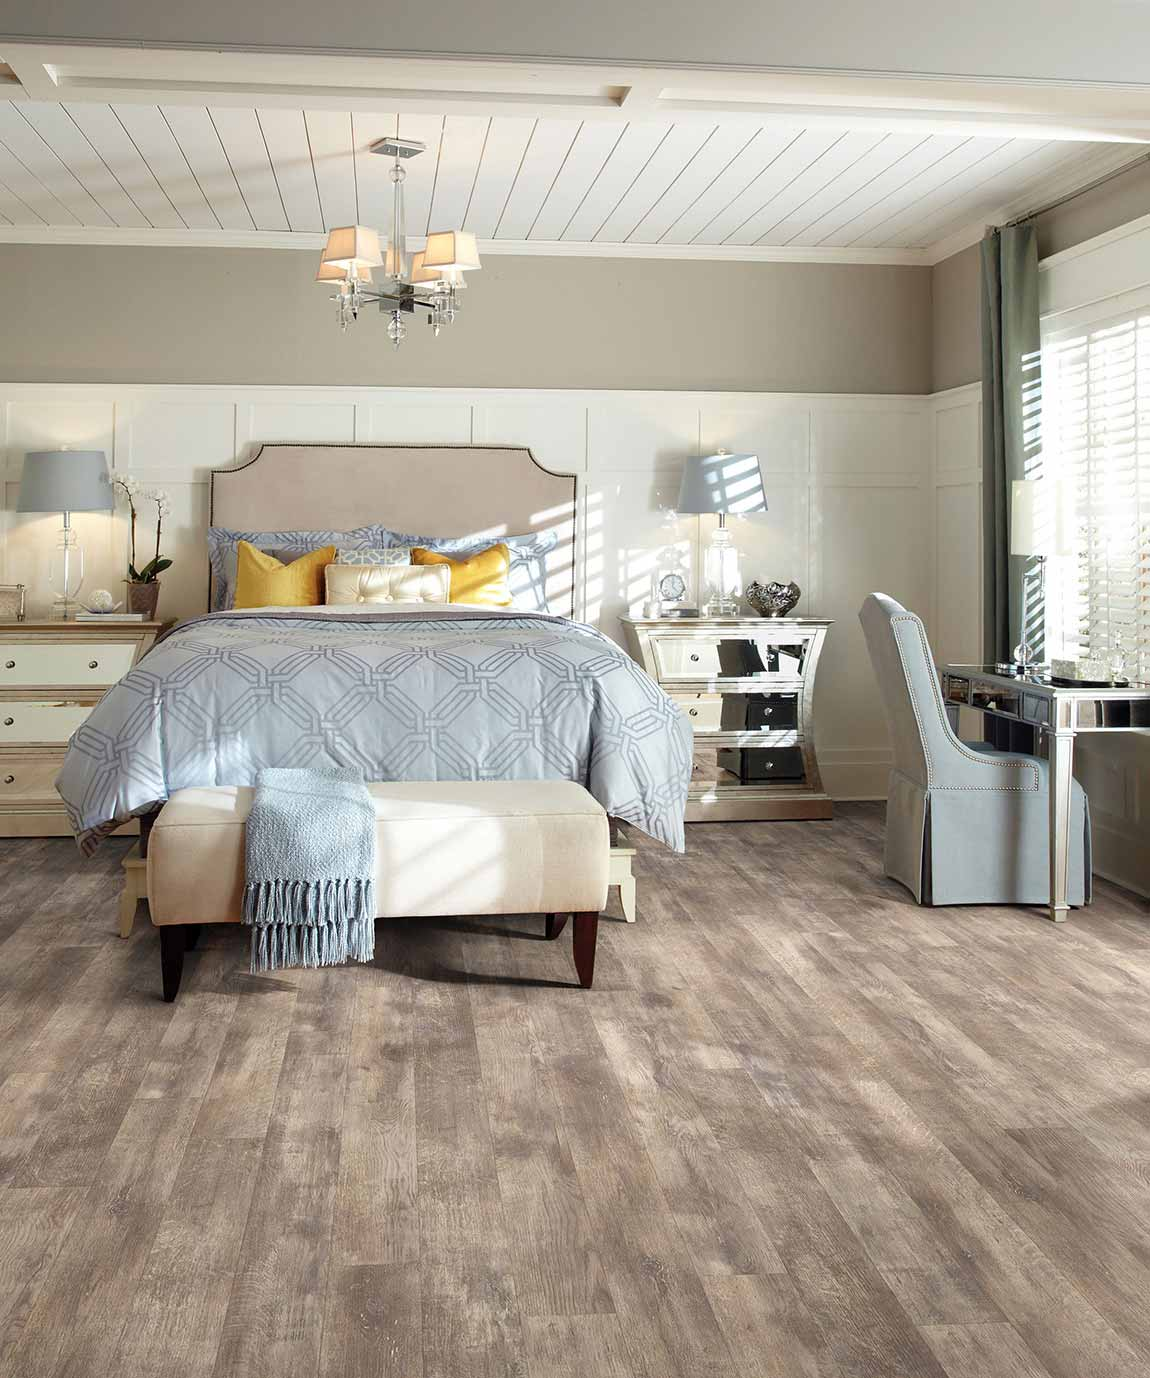 tile coastal beach house bedroom